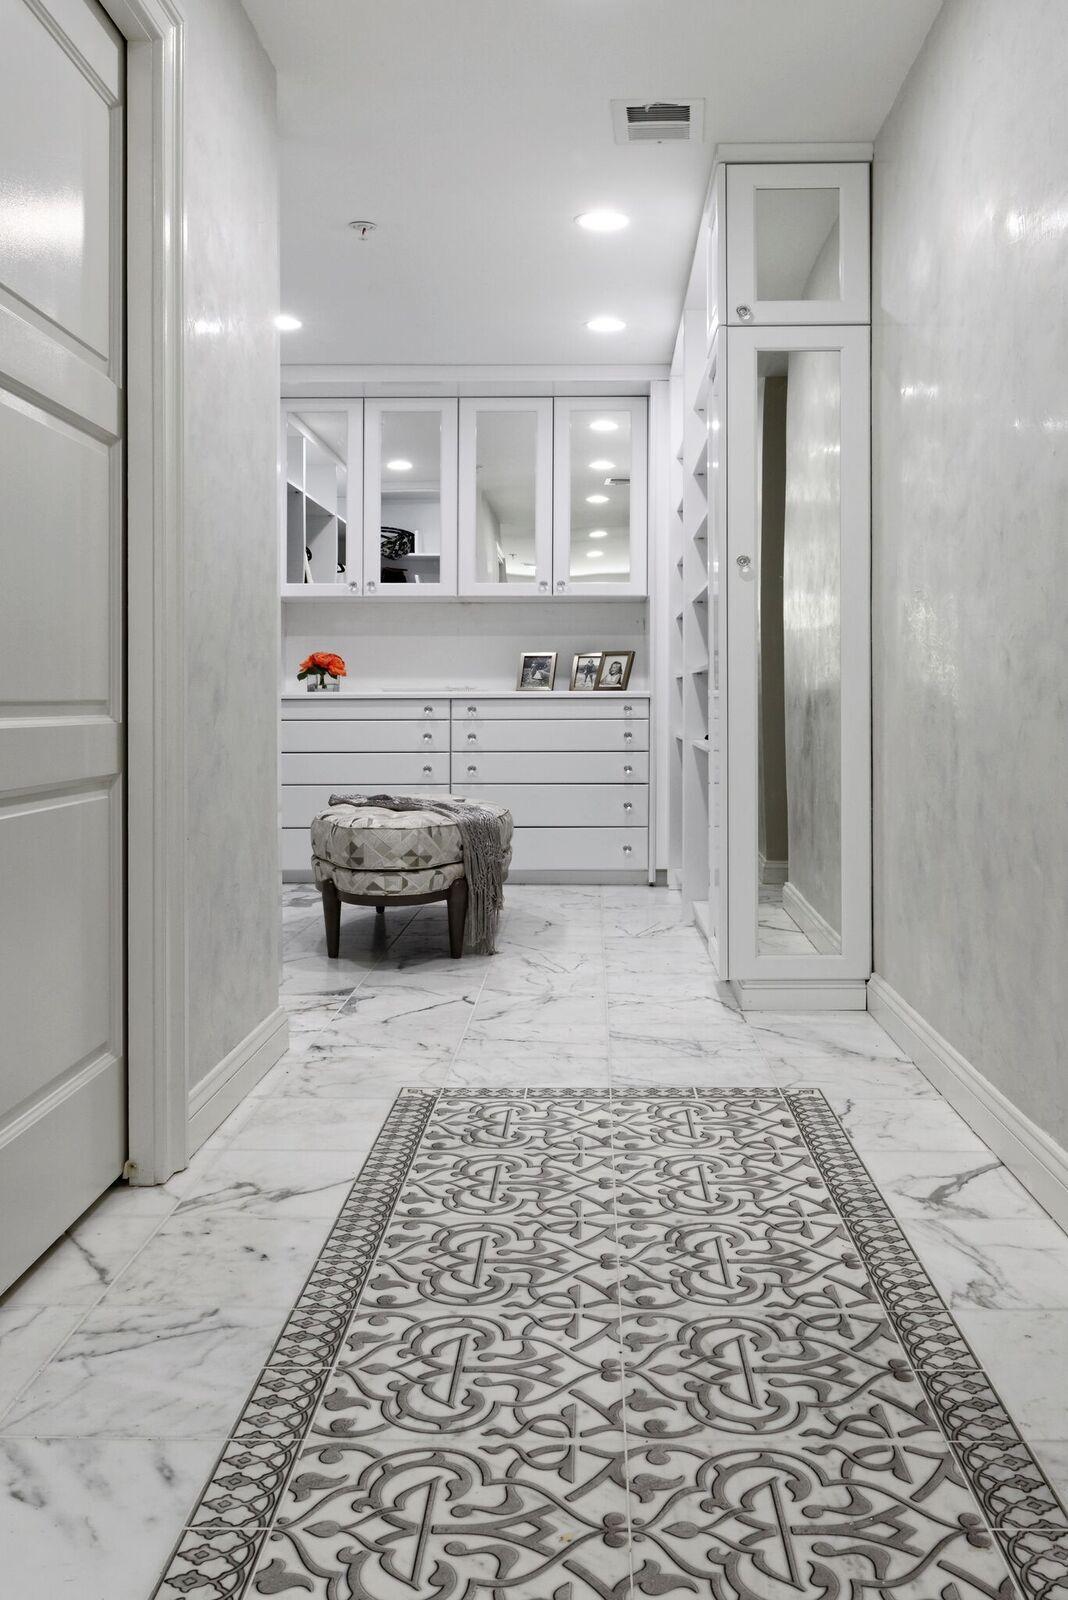 Charmed Collection Pattern Tiles Stoneimpressions Tile Rug Elegant Bathroom Rugs Master Bathroom Design [ 1600 x 1068 Pixel ]